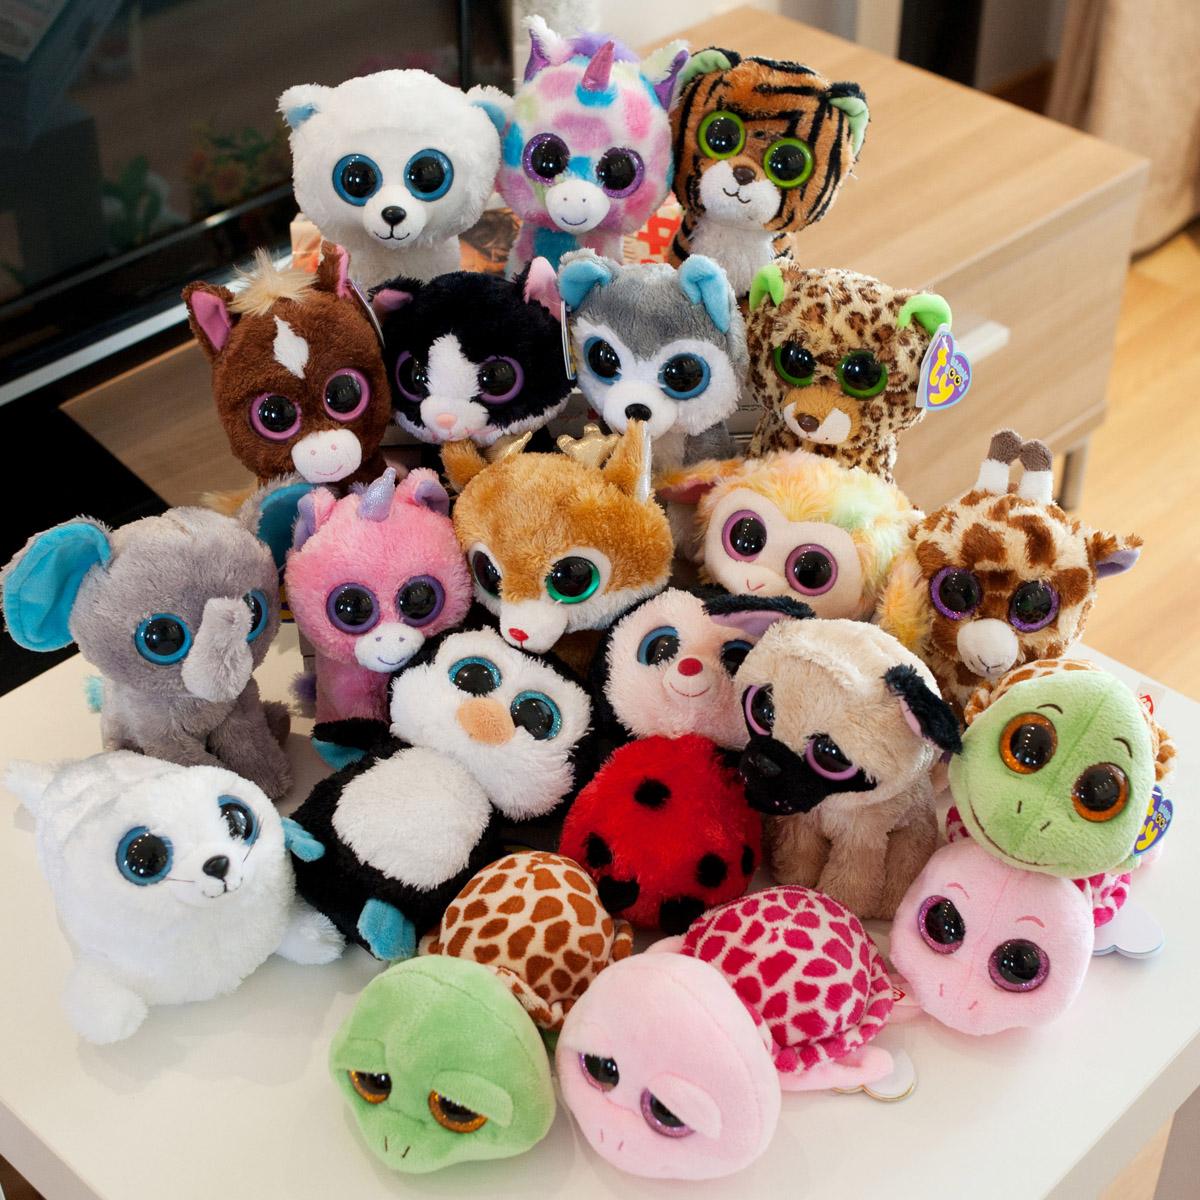 Ty big eyes series plush 15cm 5pcs/lot animal penguin polar bear plush toy doll toys for baby Beanie Boos(China (Mainland))